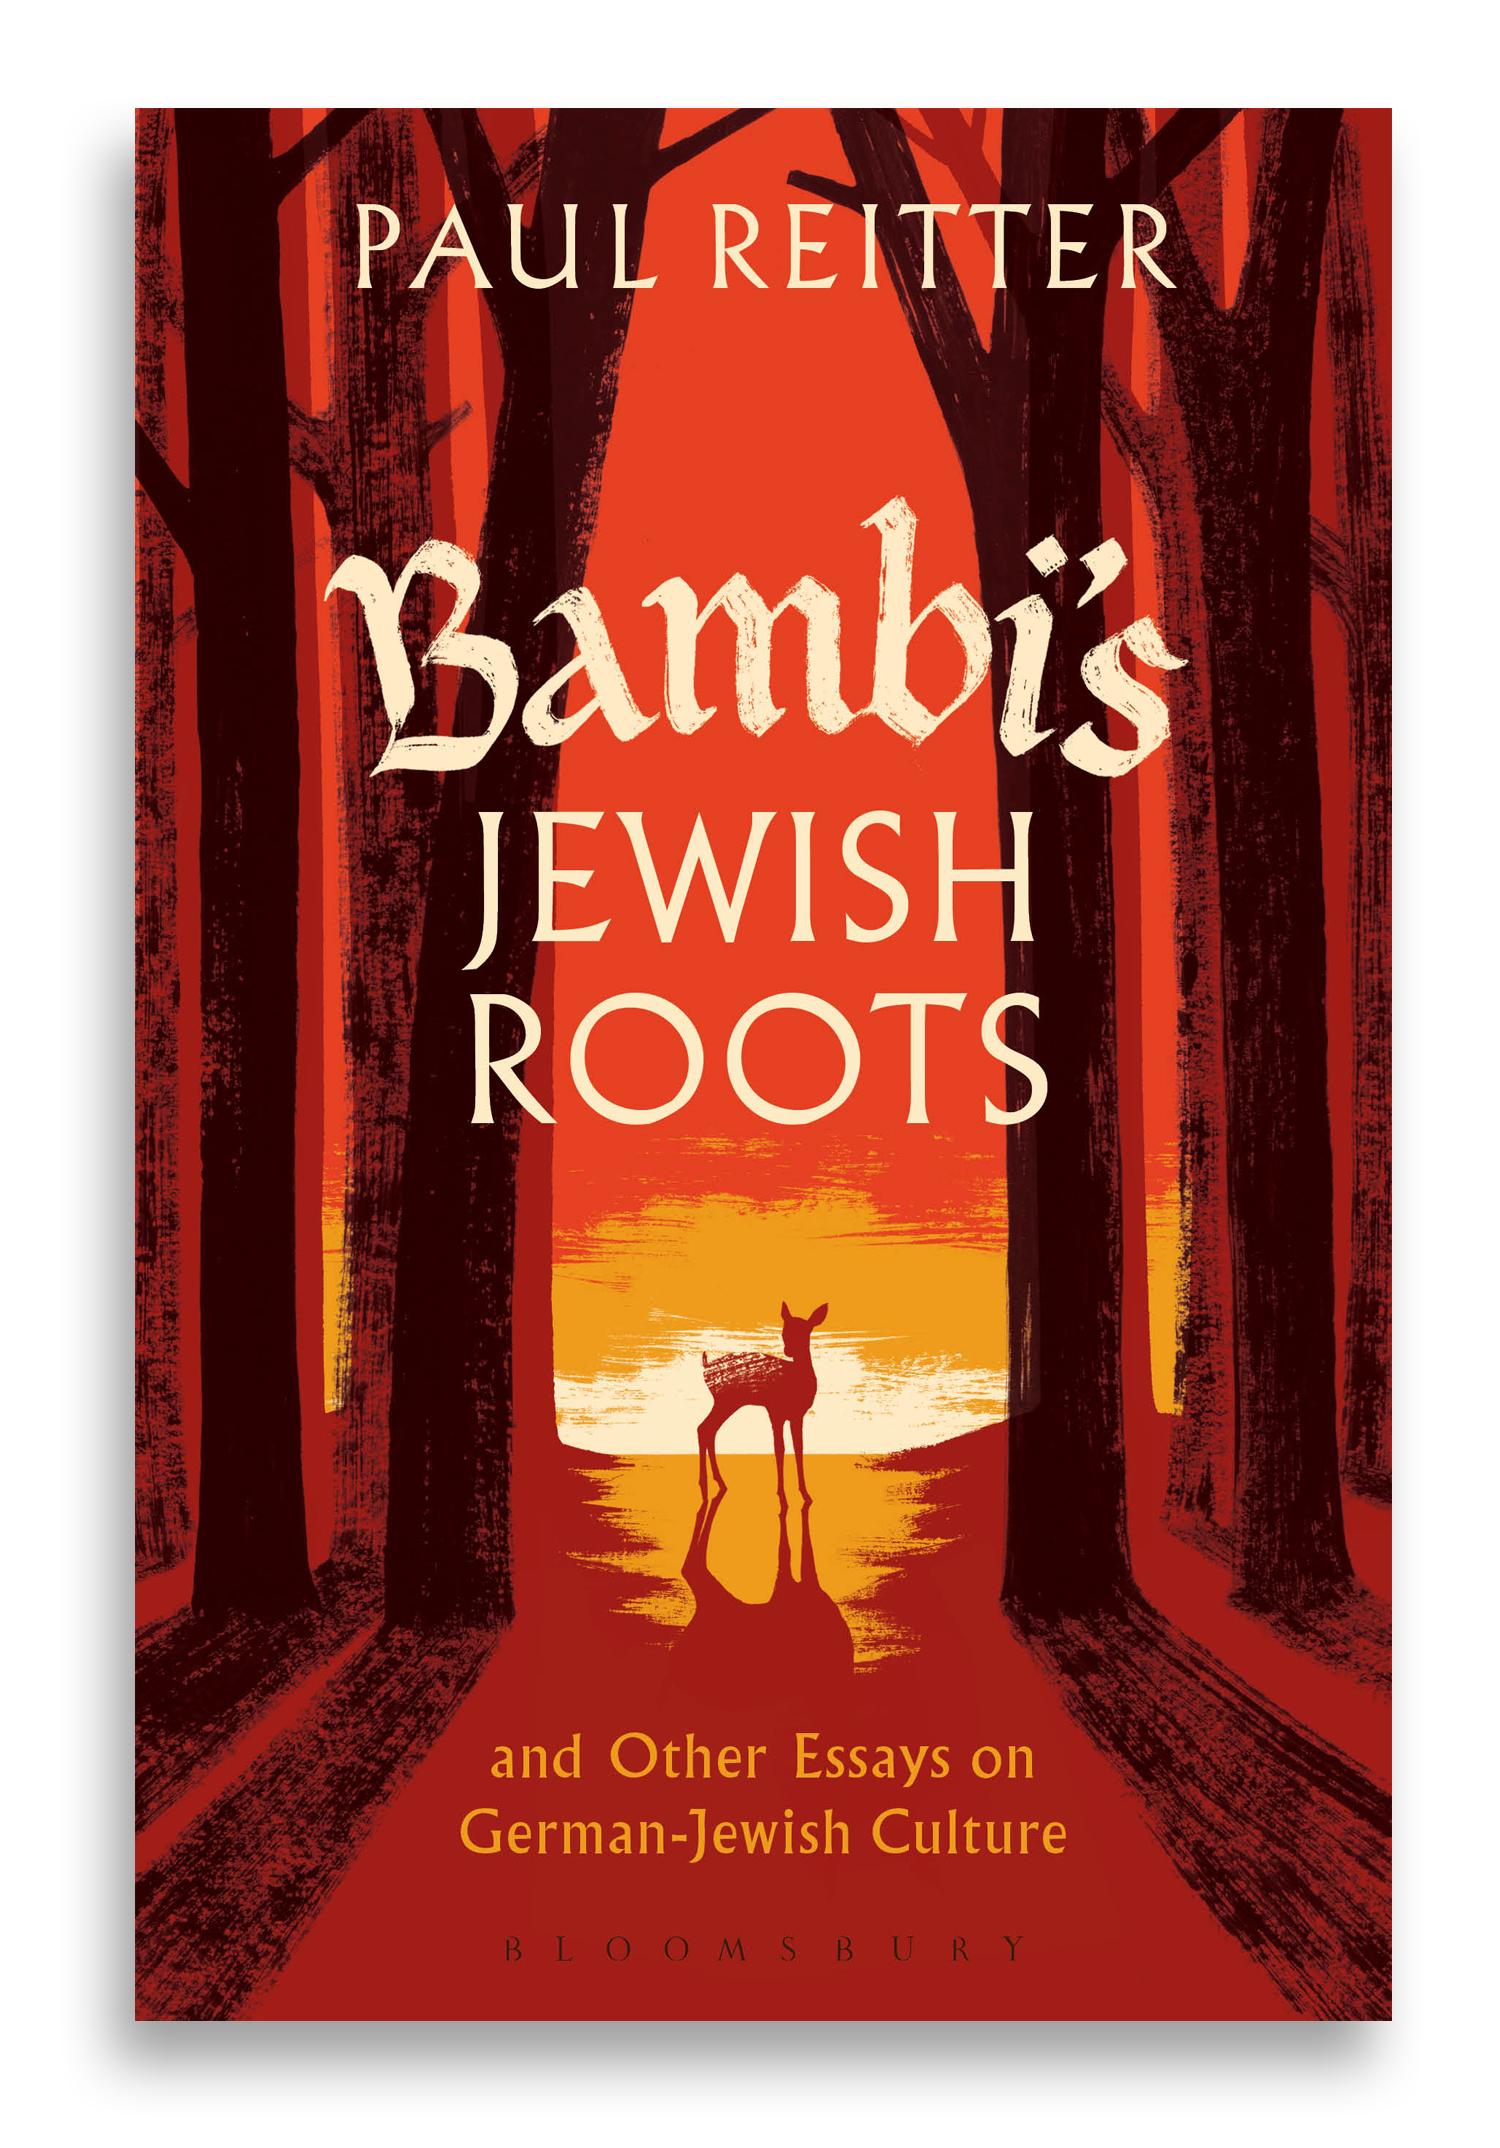 Bambis Jewish Roots.jpg